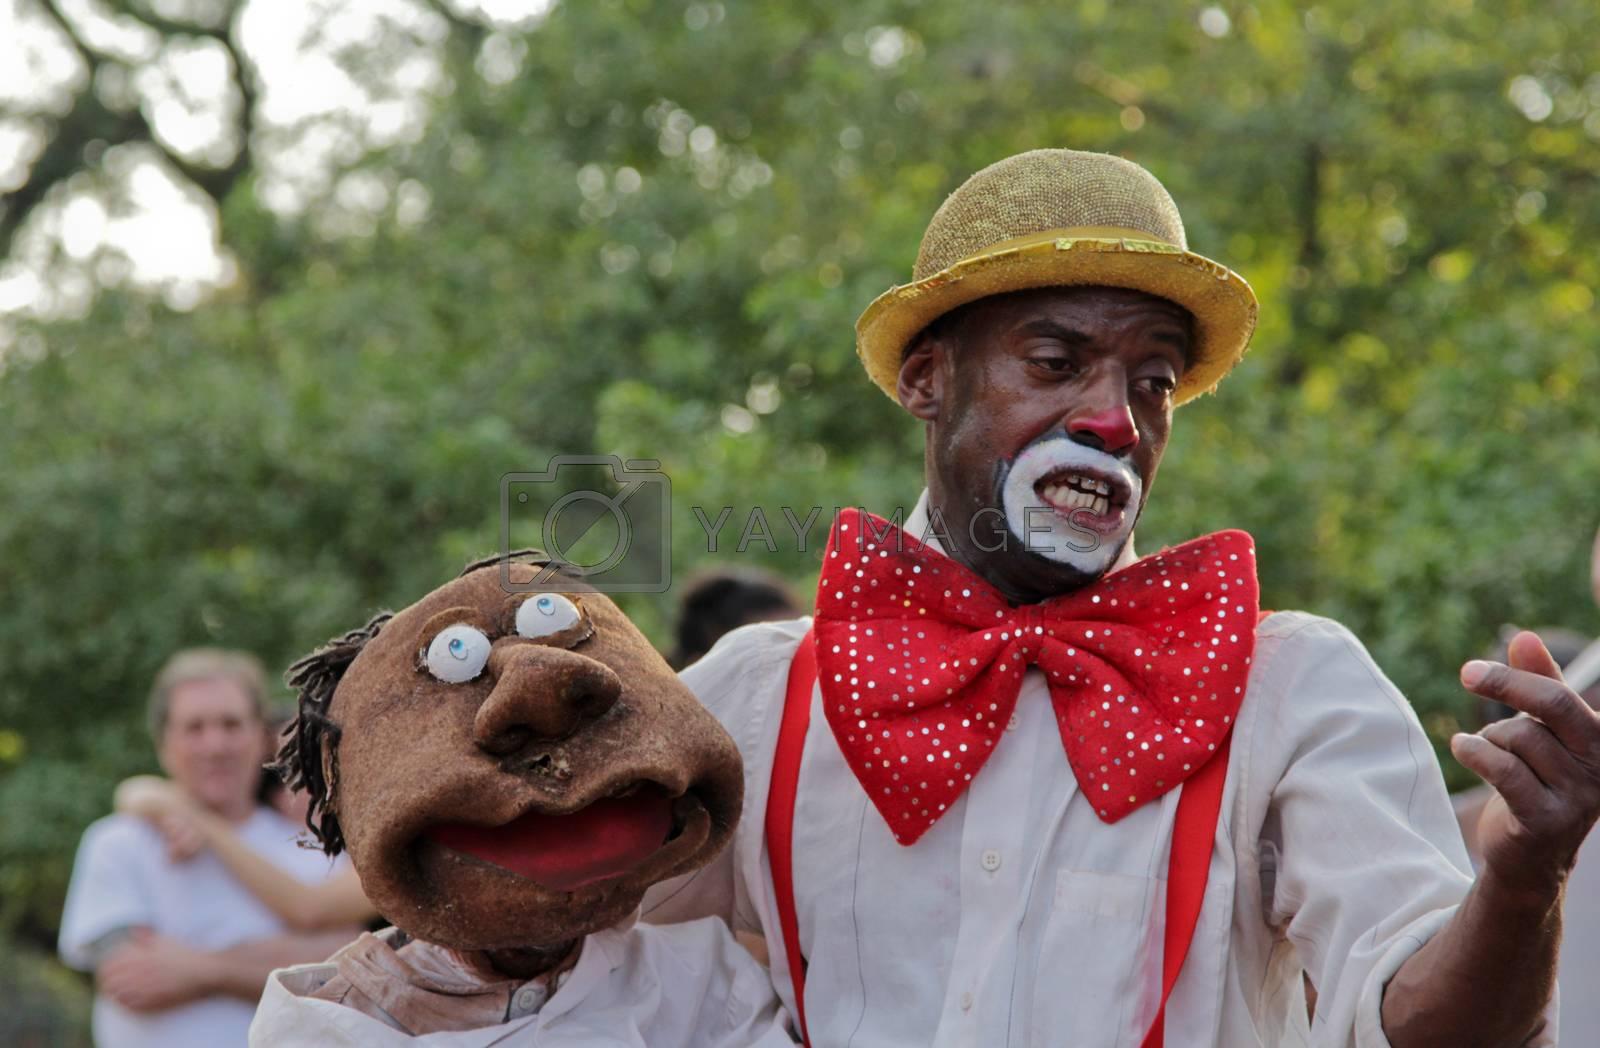 Sao Paulo, Brazil - July 18 2015: An unidentified Clown at Ibirapuera Park in Sao Paulo.